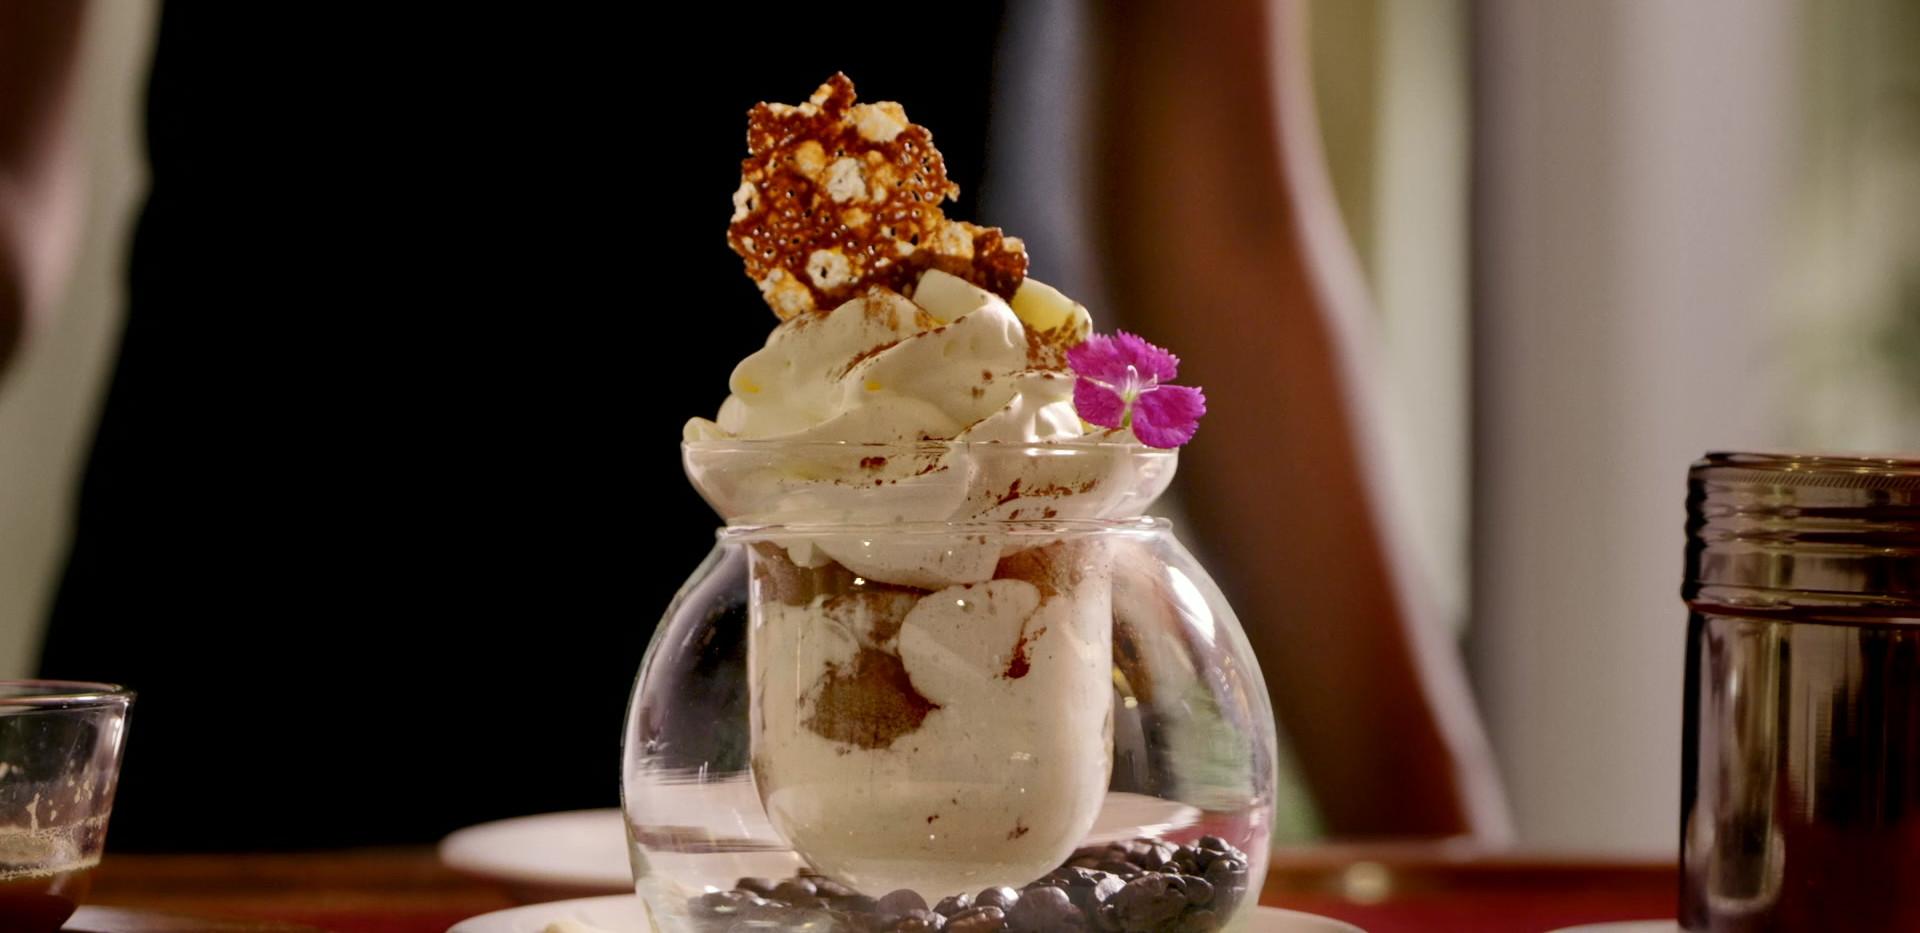 Bizcotti Anantara Food Video